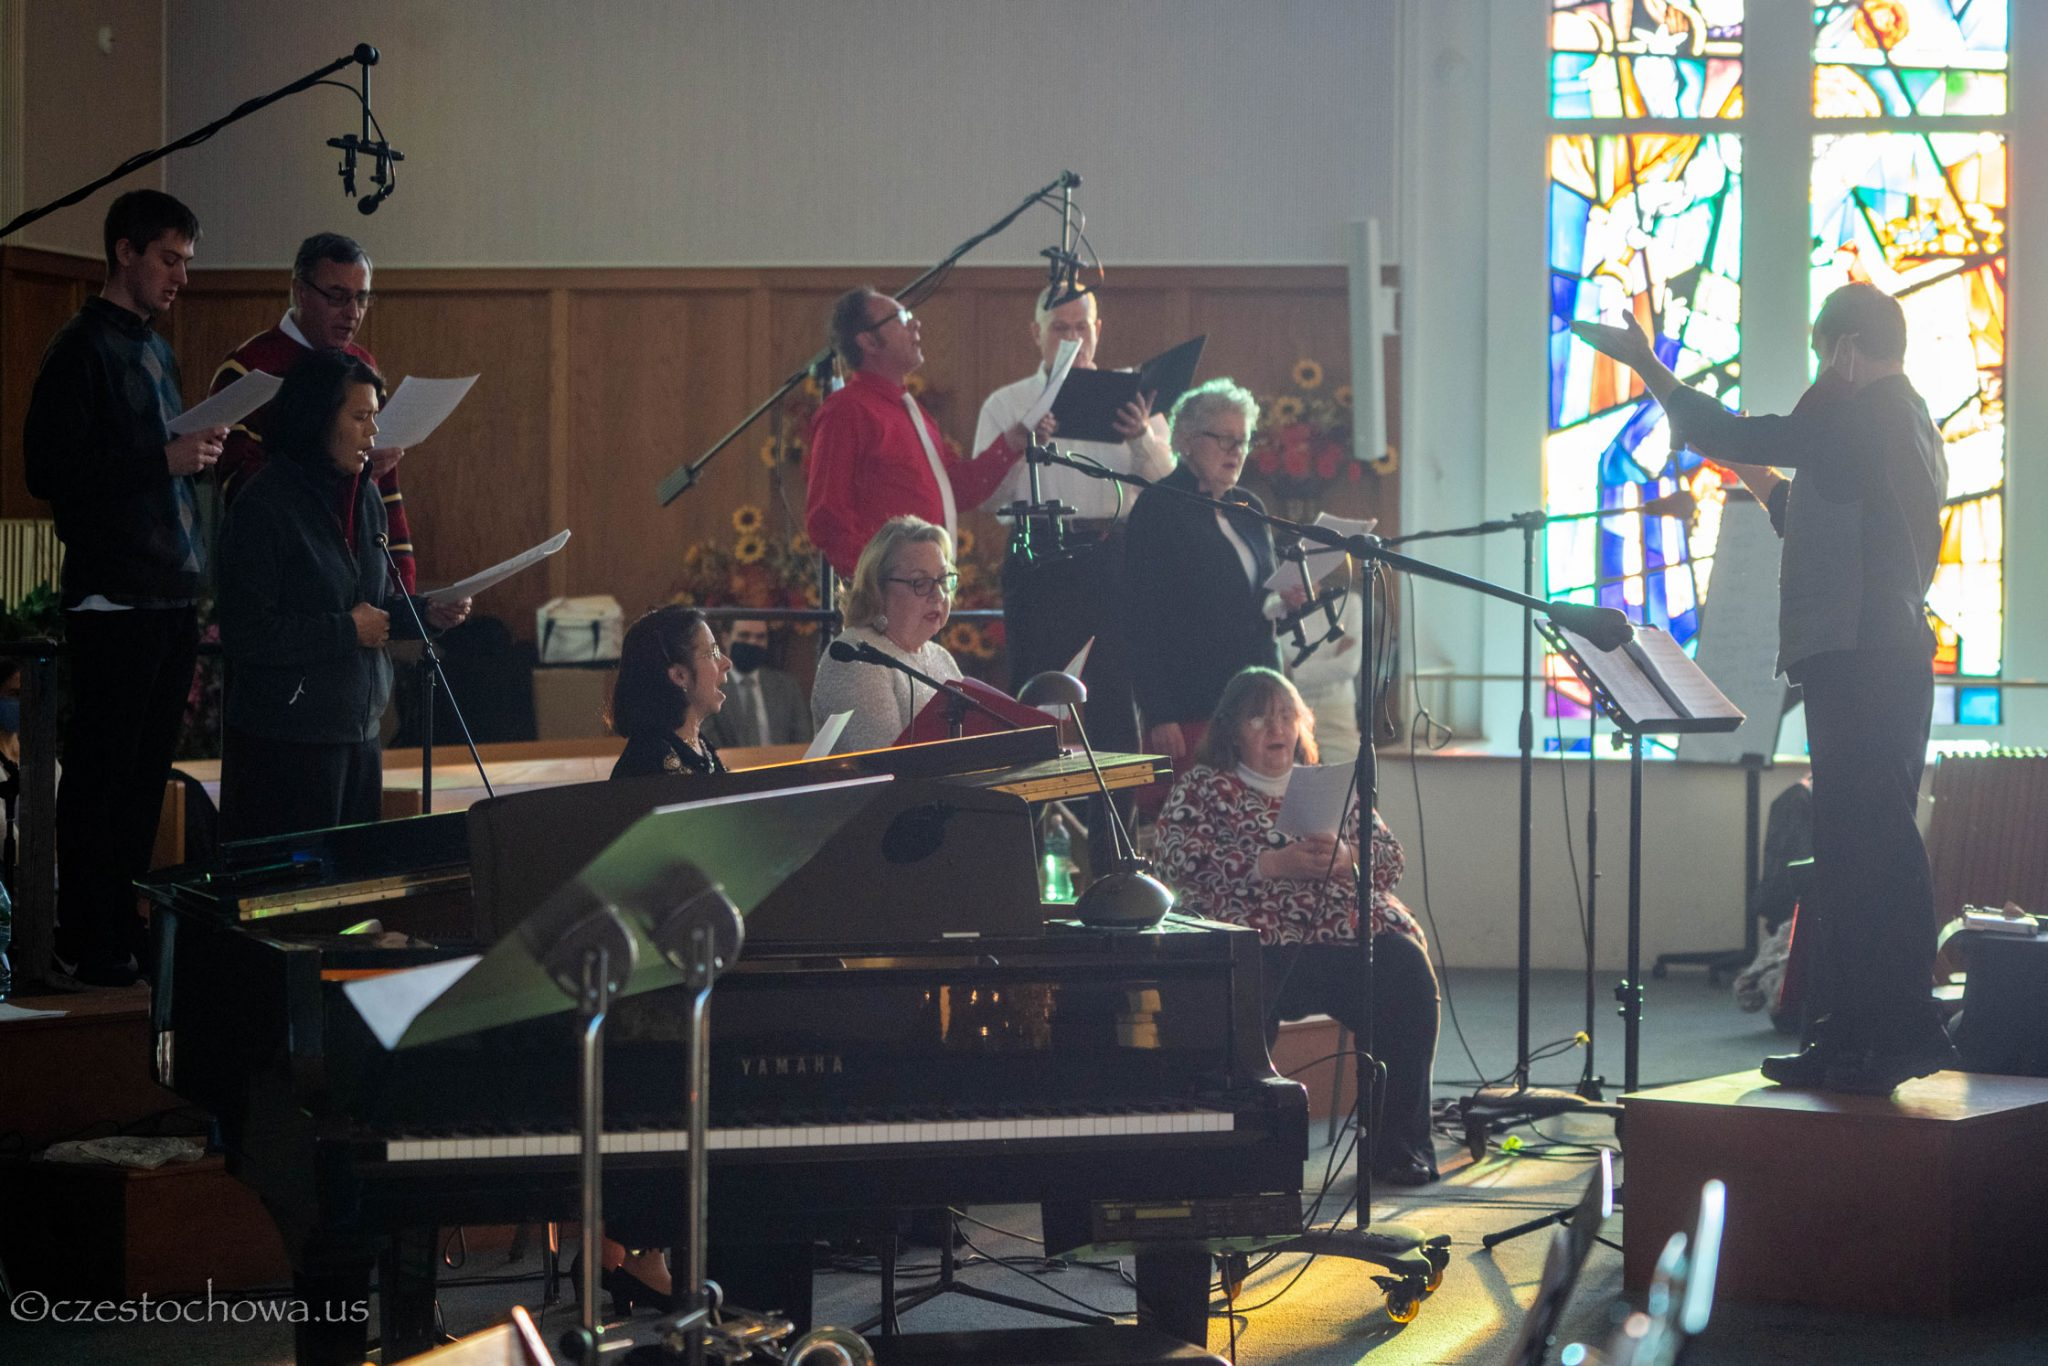 Christmas Concert in American Czestochowa